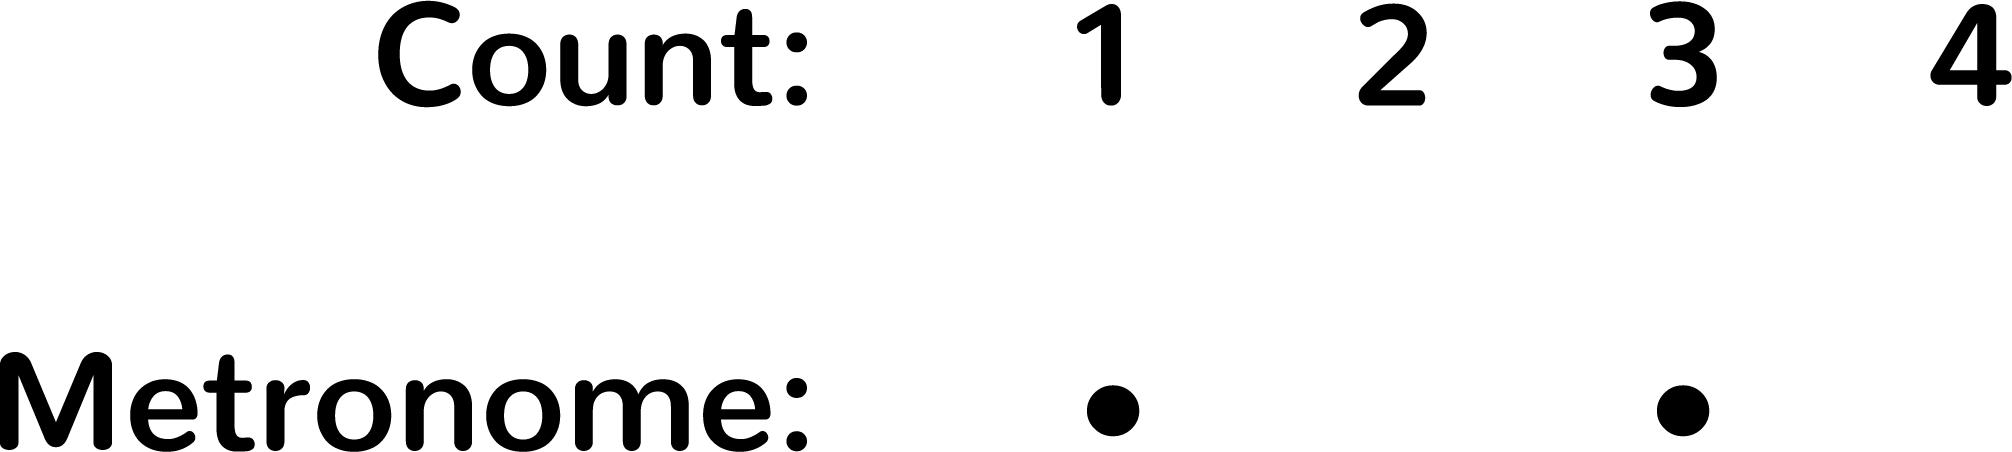 Level 2 Metronome Exercise